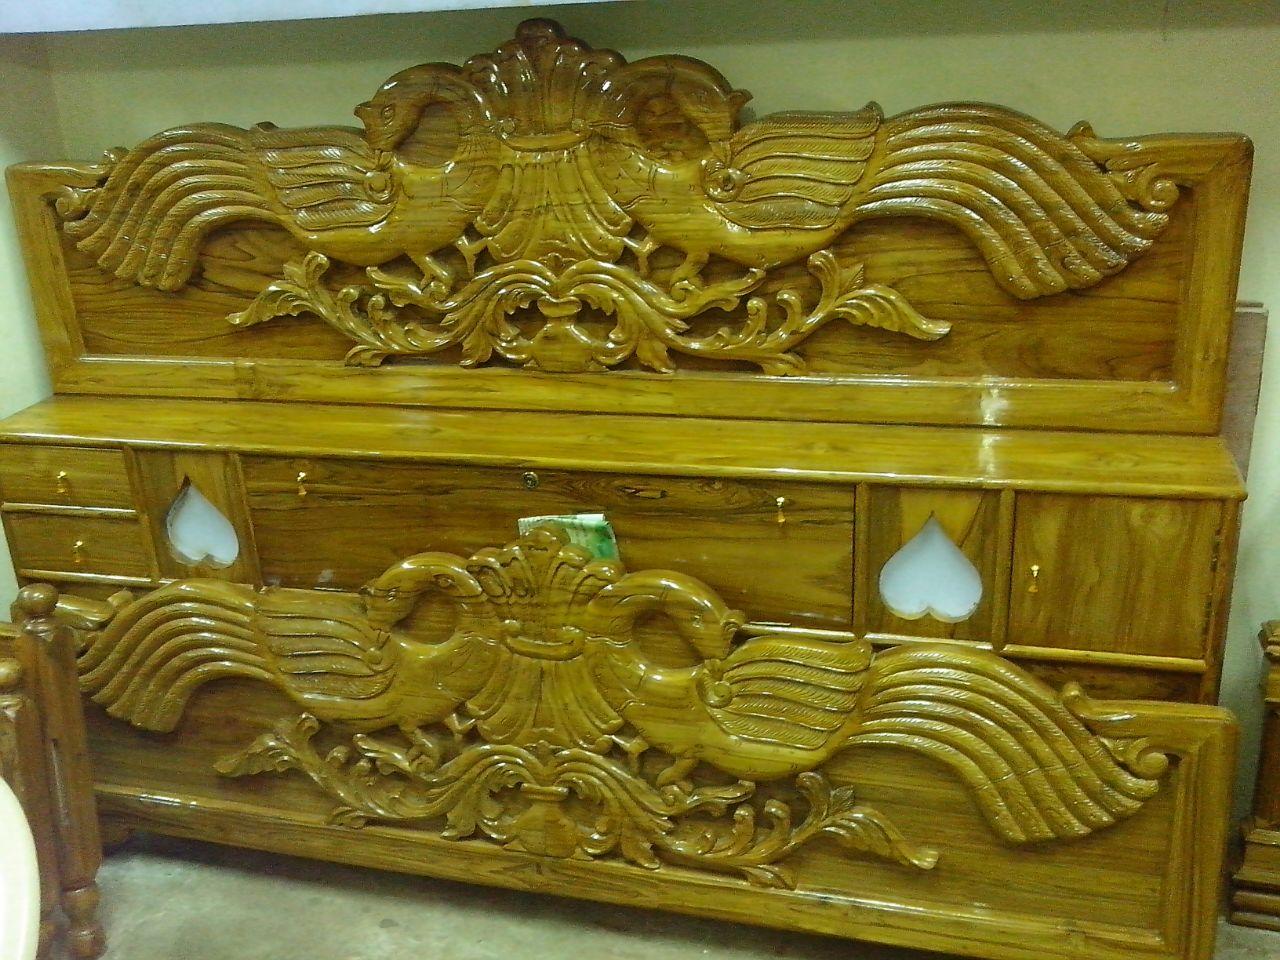 Shree Ram Timber and Furniture